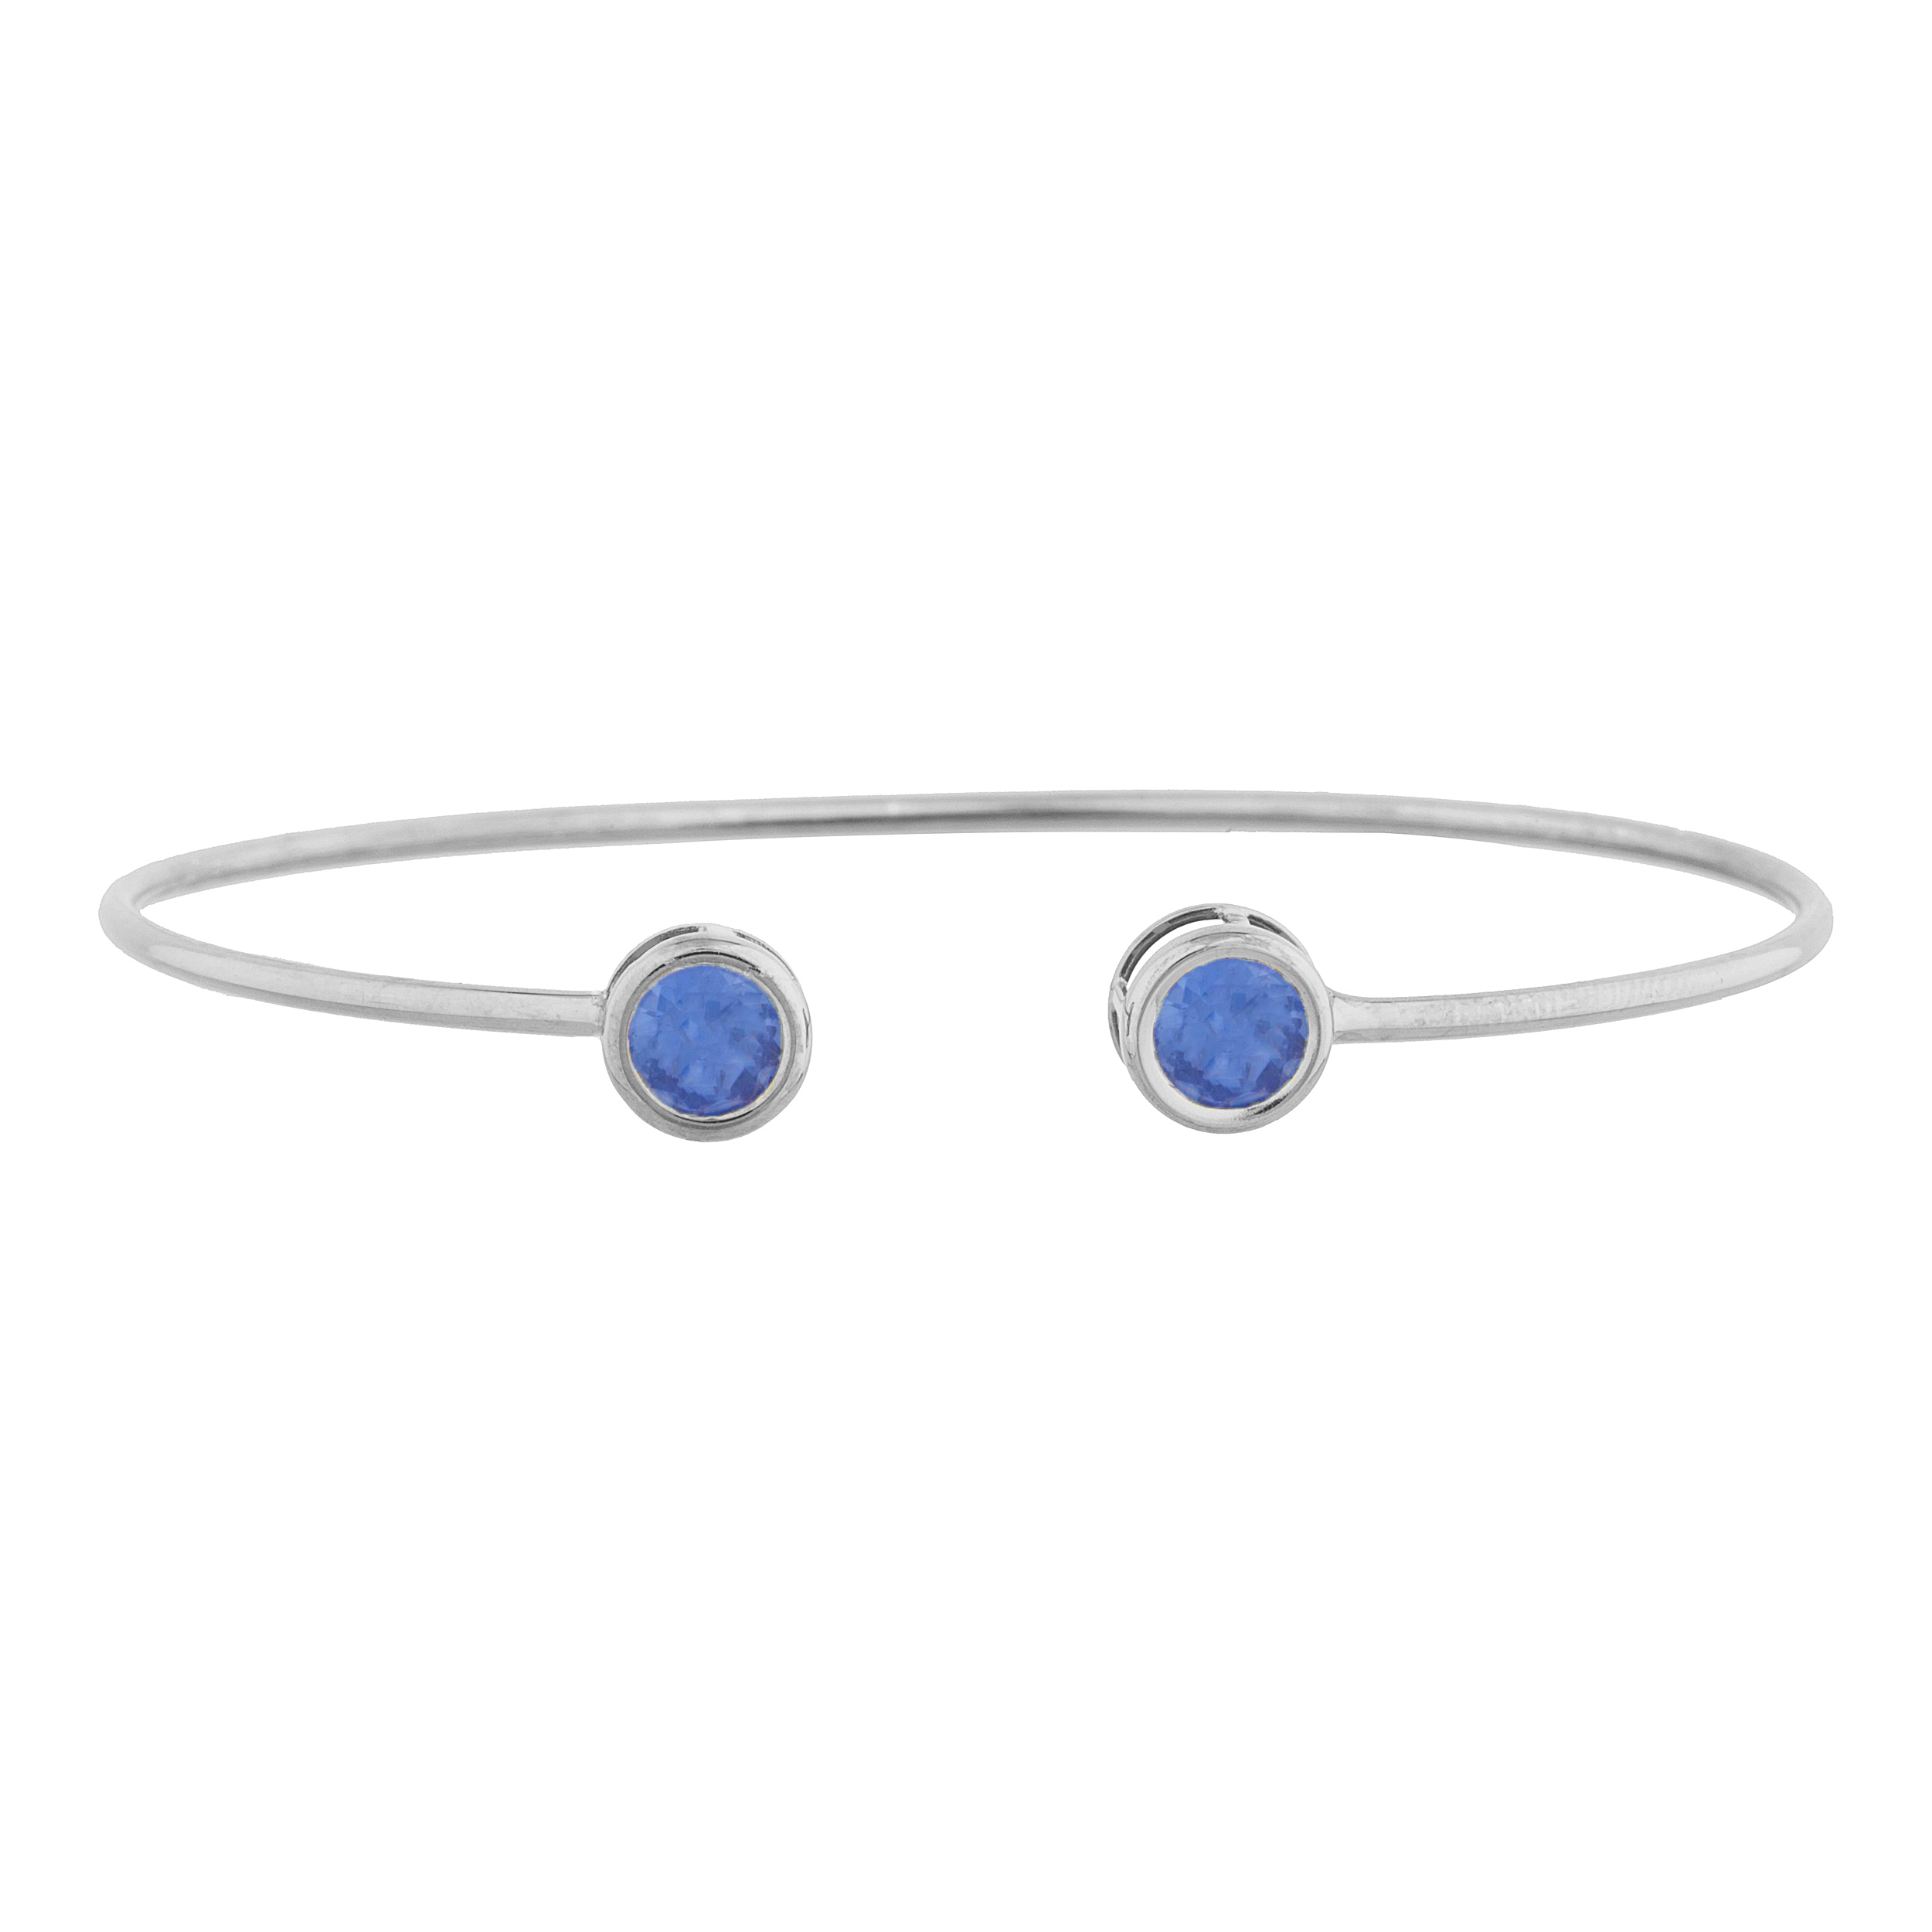 2 Ct Tanzanite Round Bezel Bangle Bracelet .925 Sterling Silver by Elizabeth Jewelry Inc